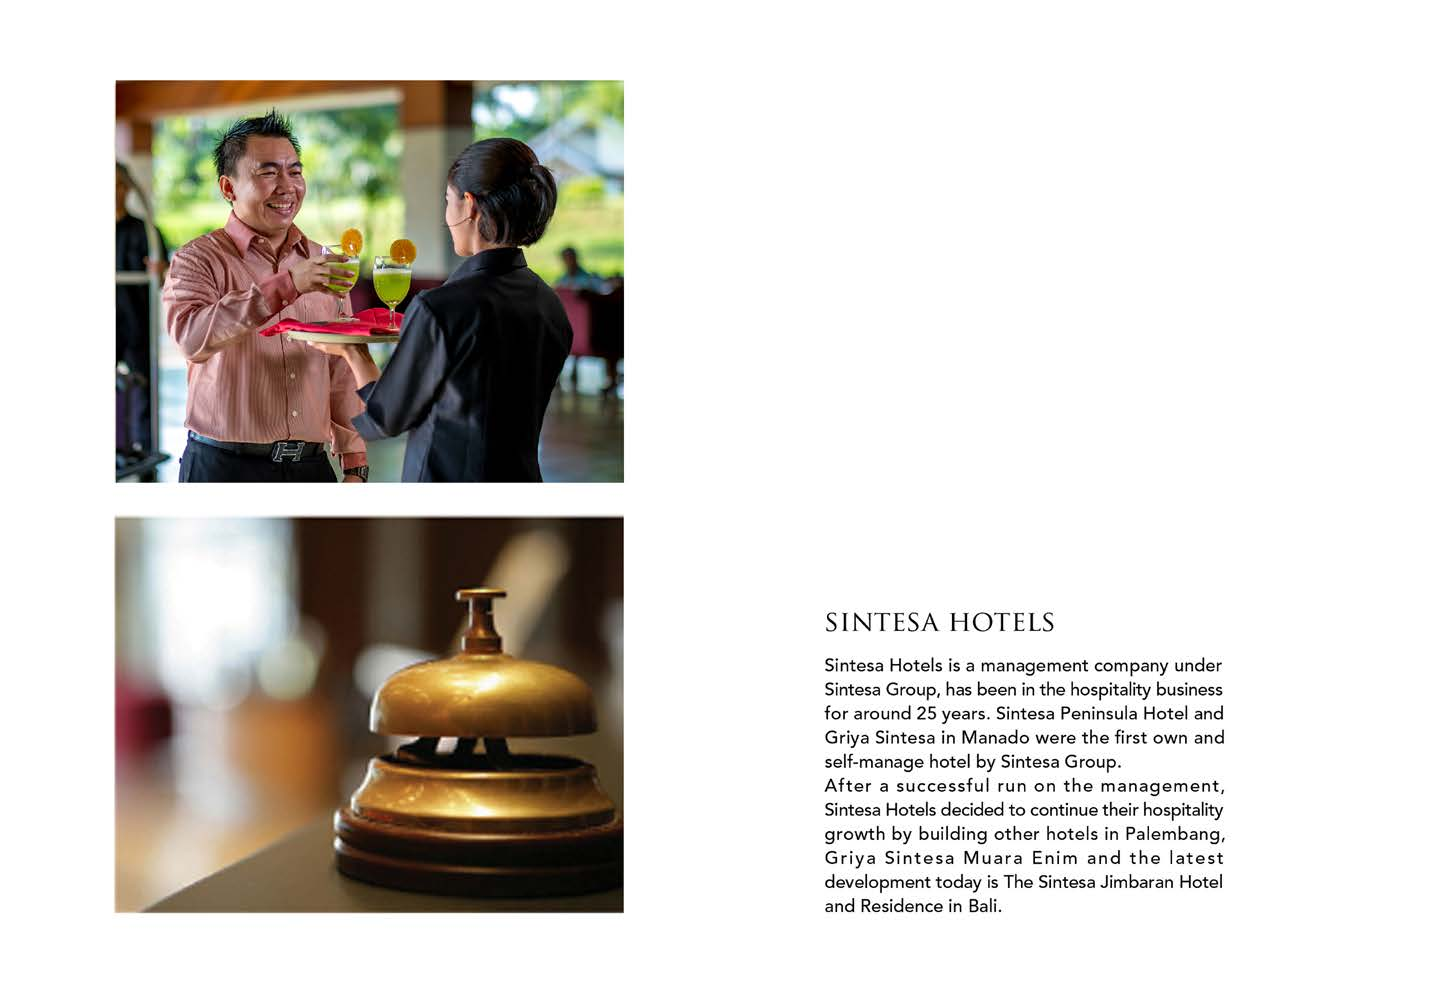 sintesa-hotel4